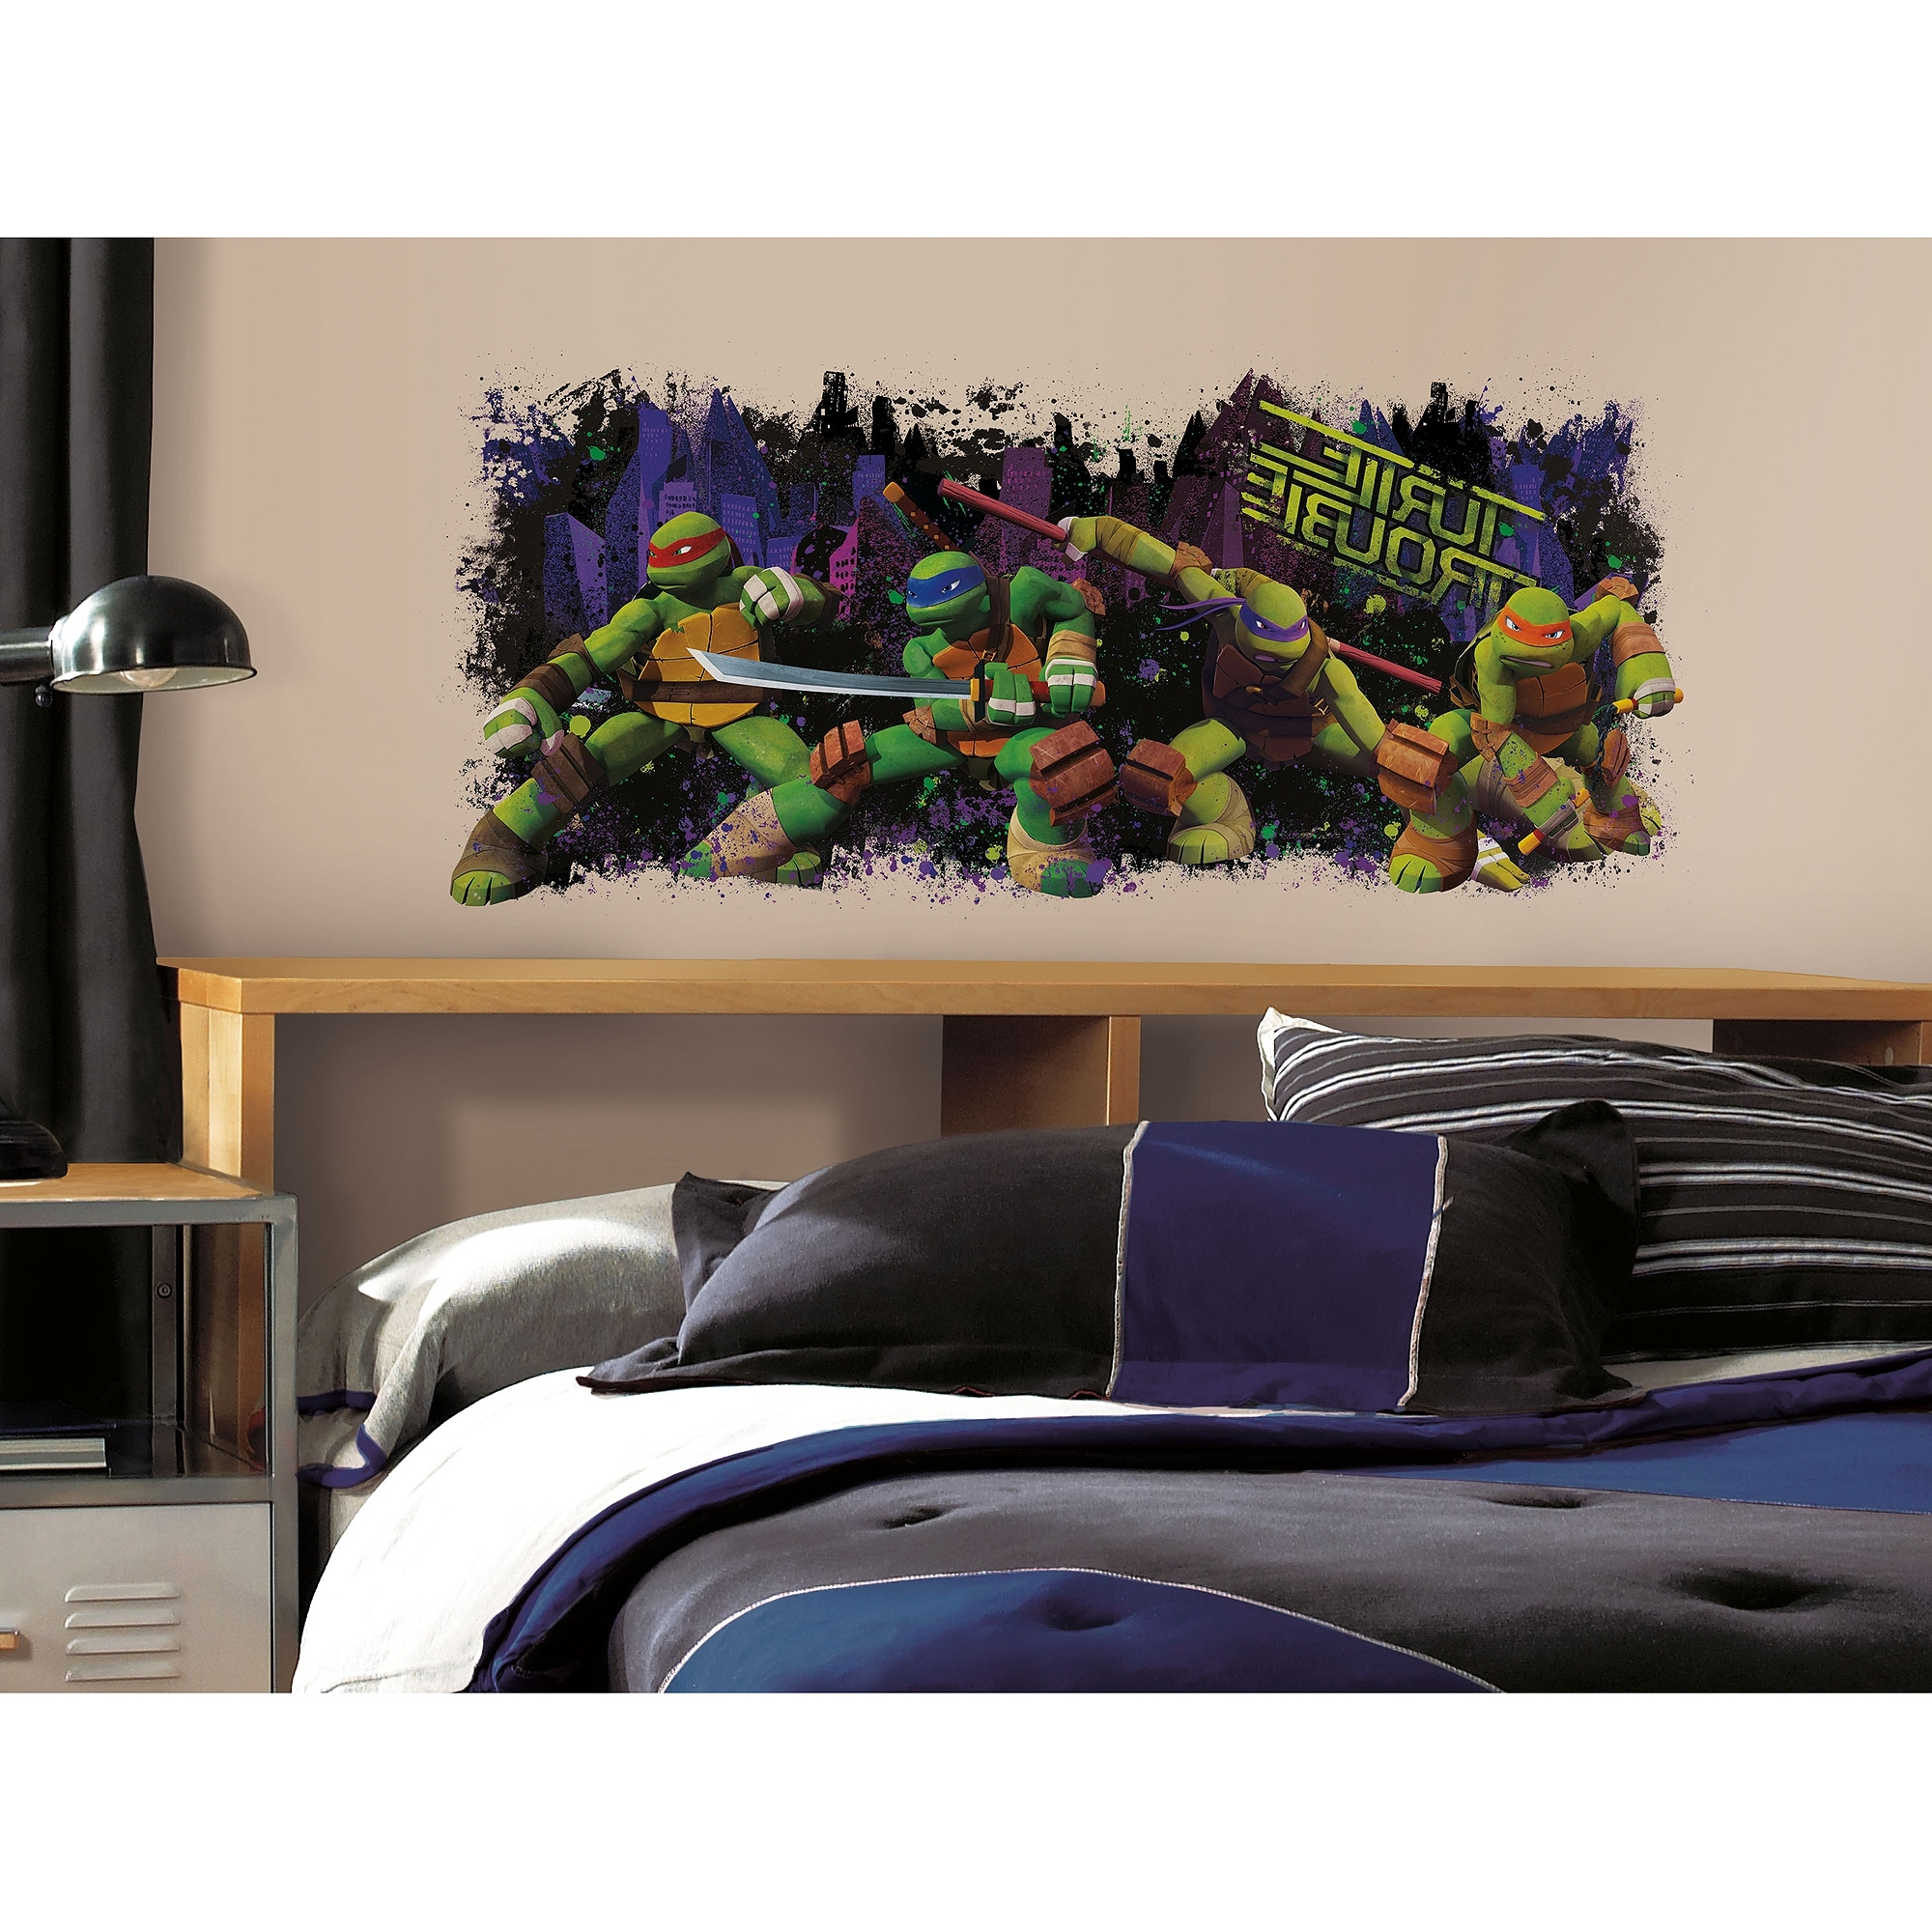 Roommates Teenage Mutant Ninja Turtles Trouble Graphic Peel And In Famous Ninja Turtle Wall Art (View 11 of 15)